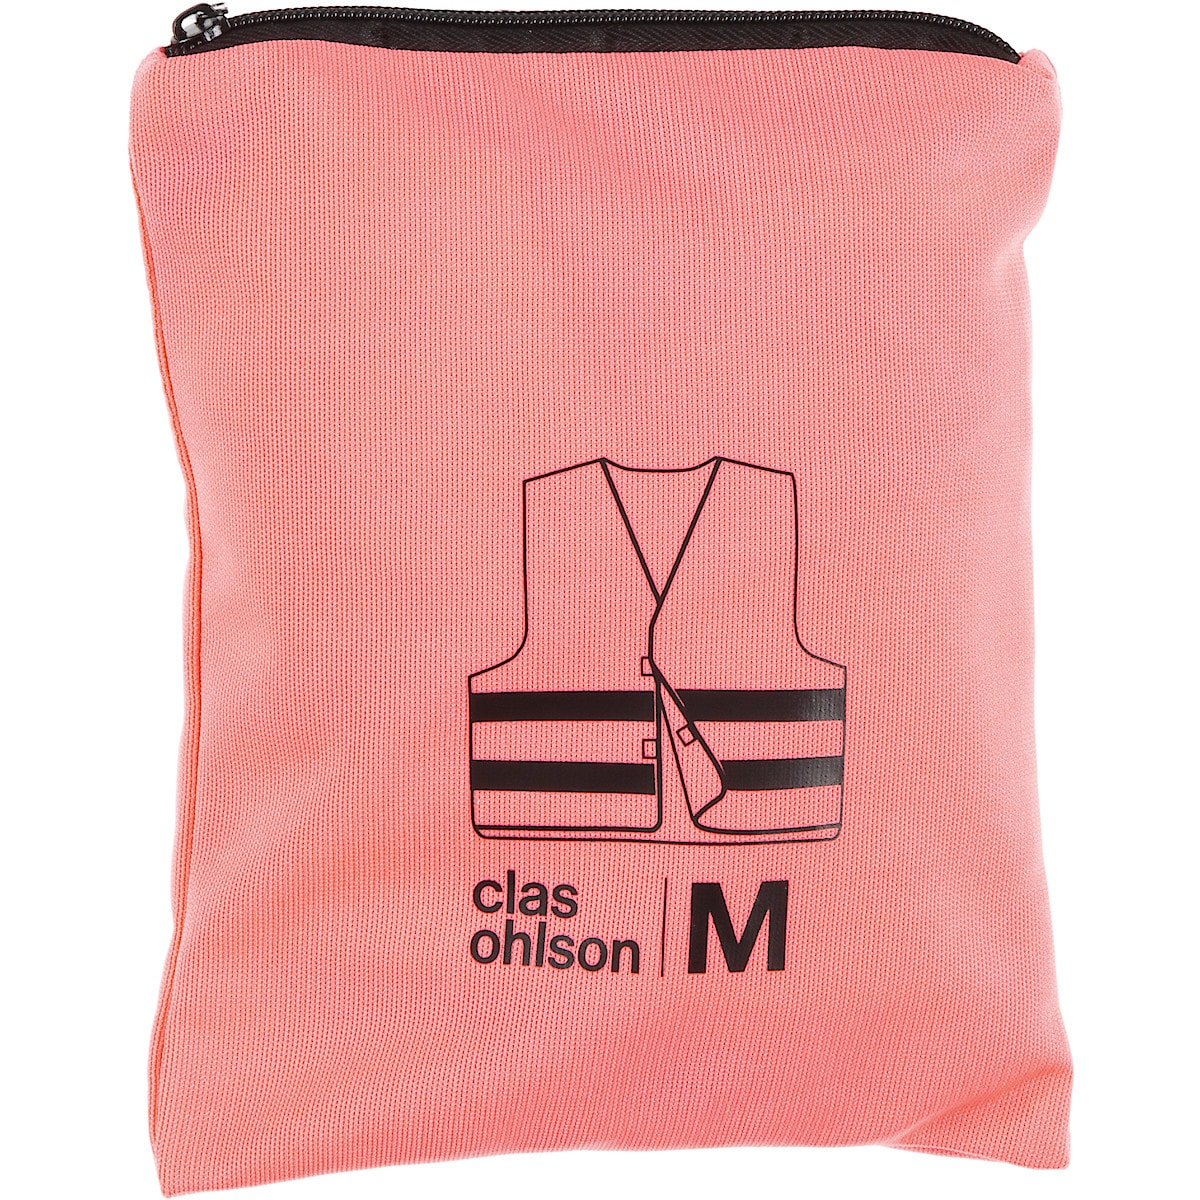 Heijastinliivi vaaleanpunainen, Clas Ohlson